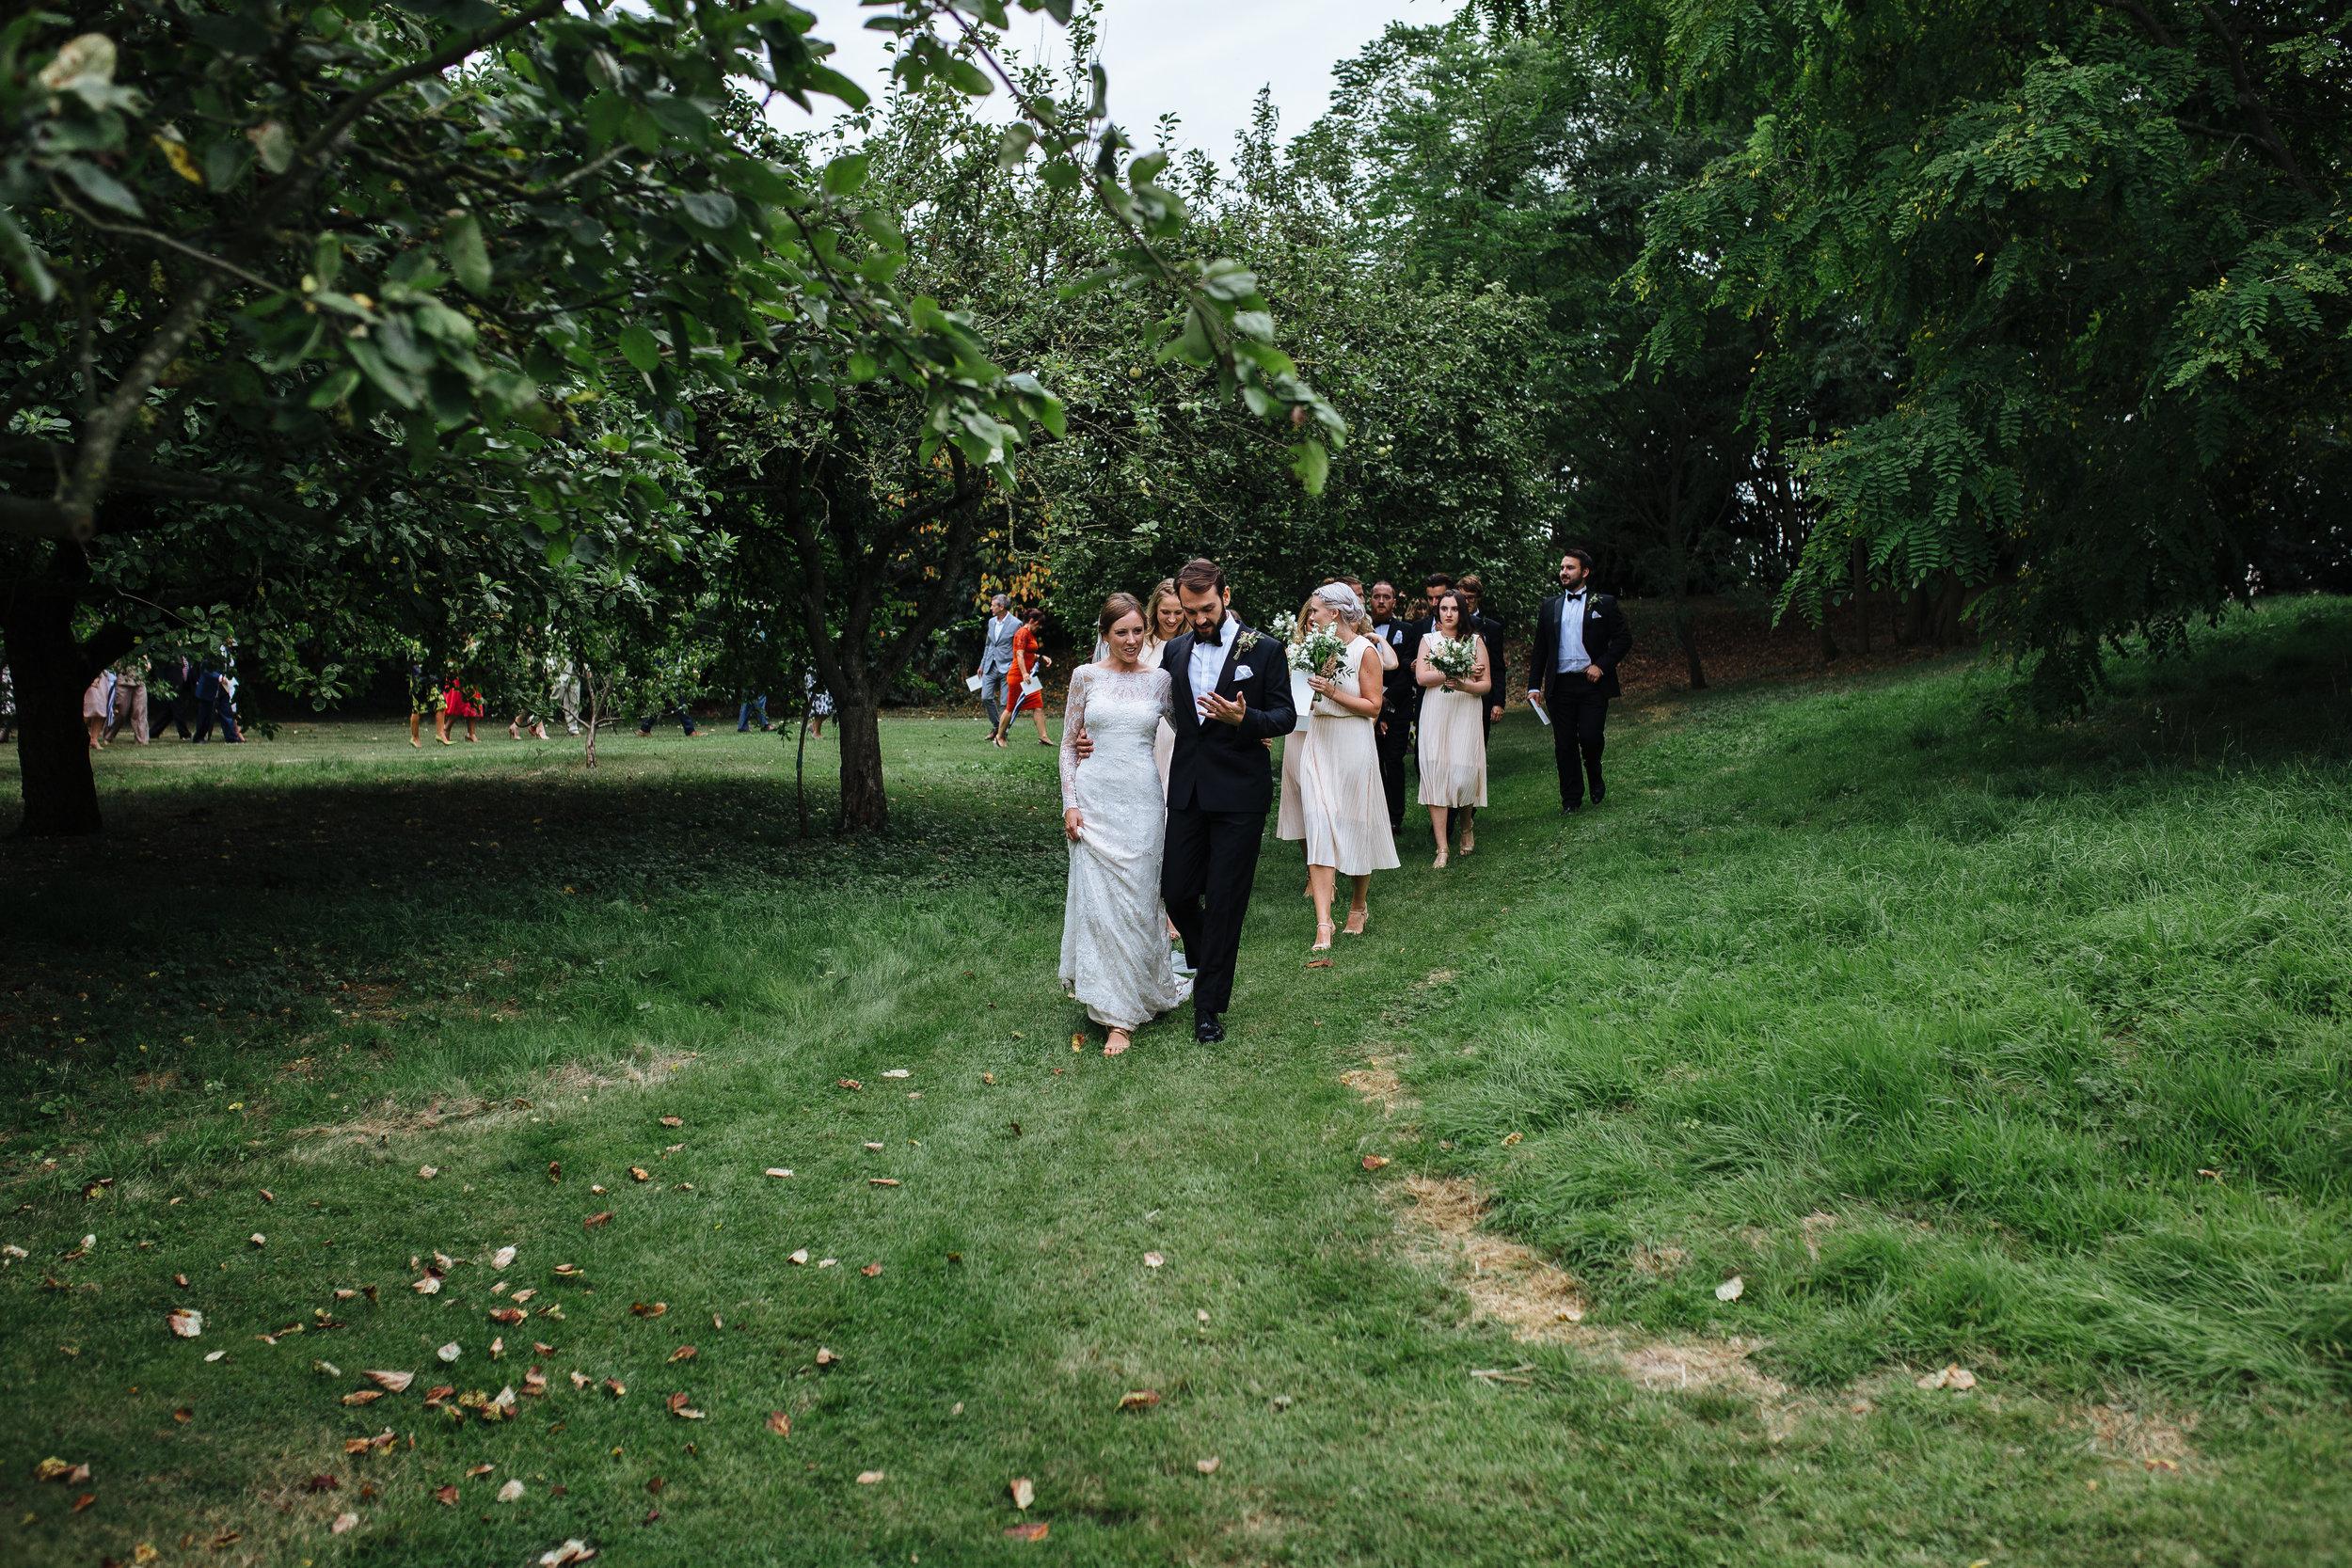 CHILDERLEY HALL WEDDING 077.JPG